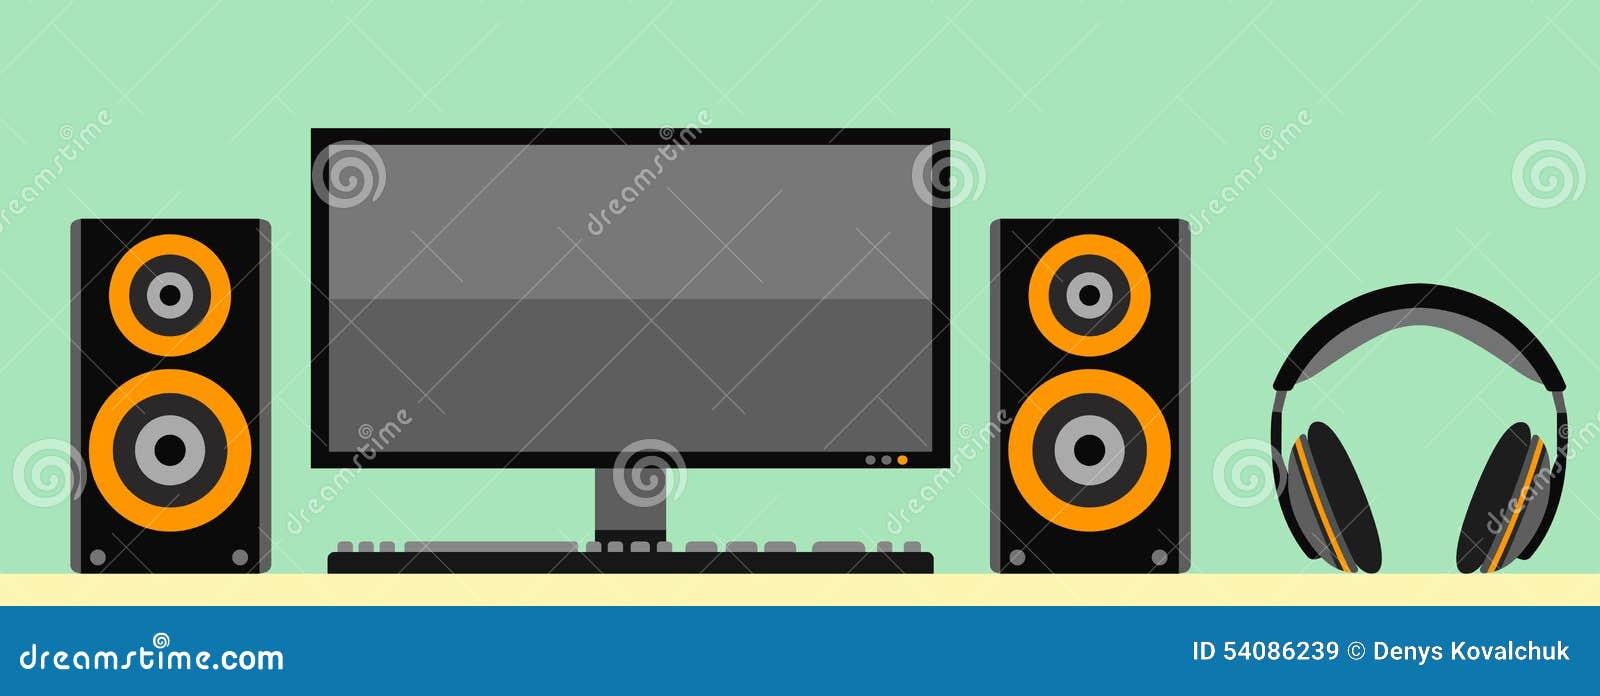 Computermonitor met toetsenbord akoestische luidspreker en hoofdtelefoons